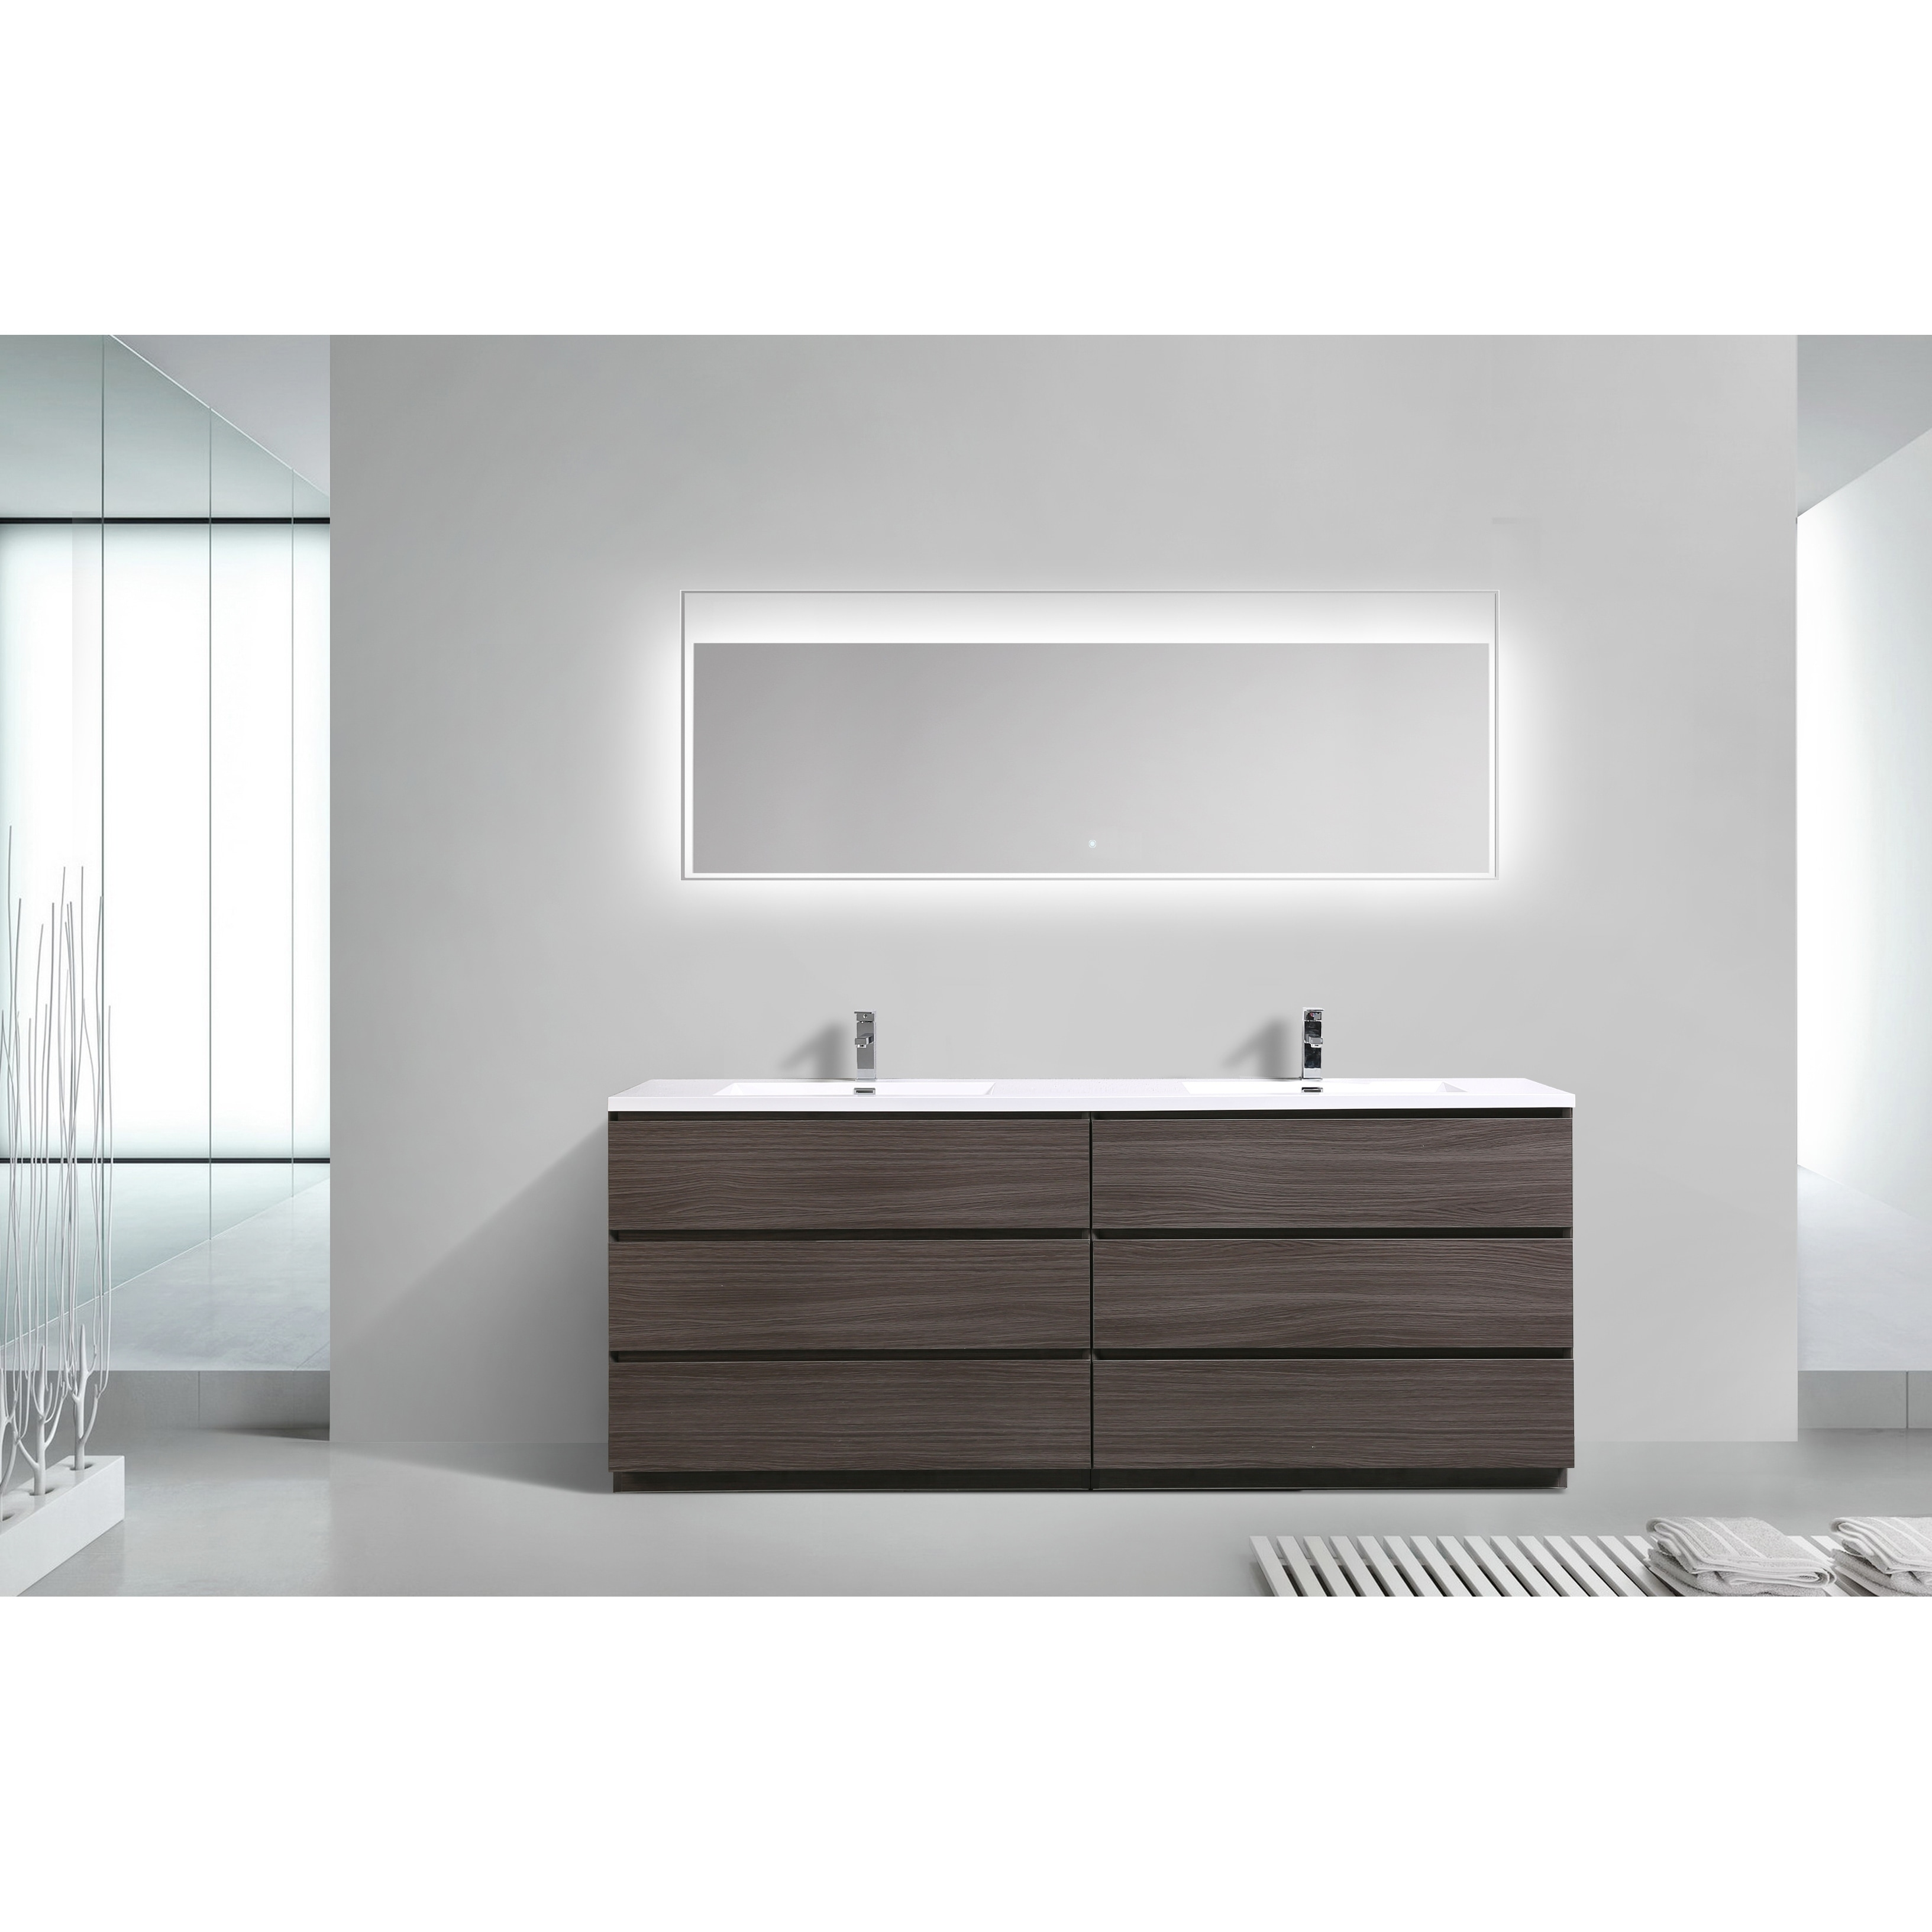 Moreno Bath MOA 84 Inch Free Standing Modern Bathroom Vanity With  Reinforced Acrylic Double Sink